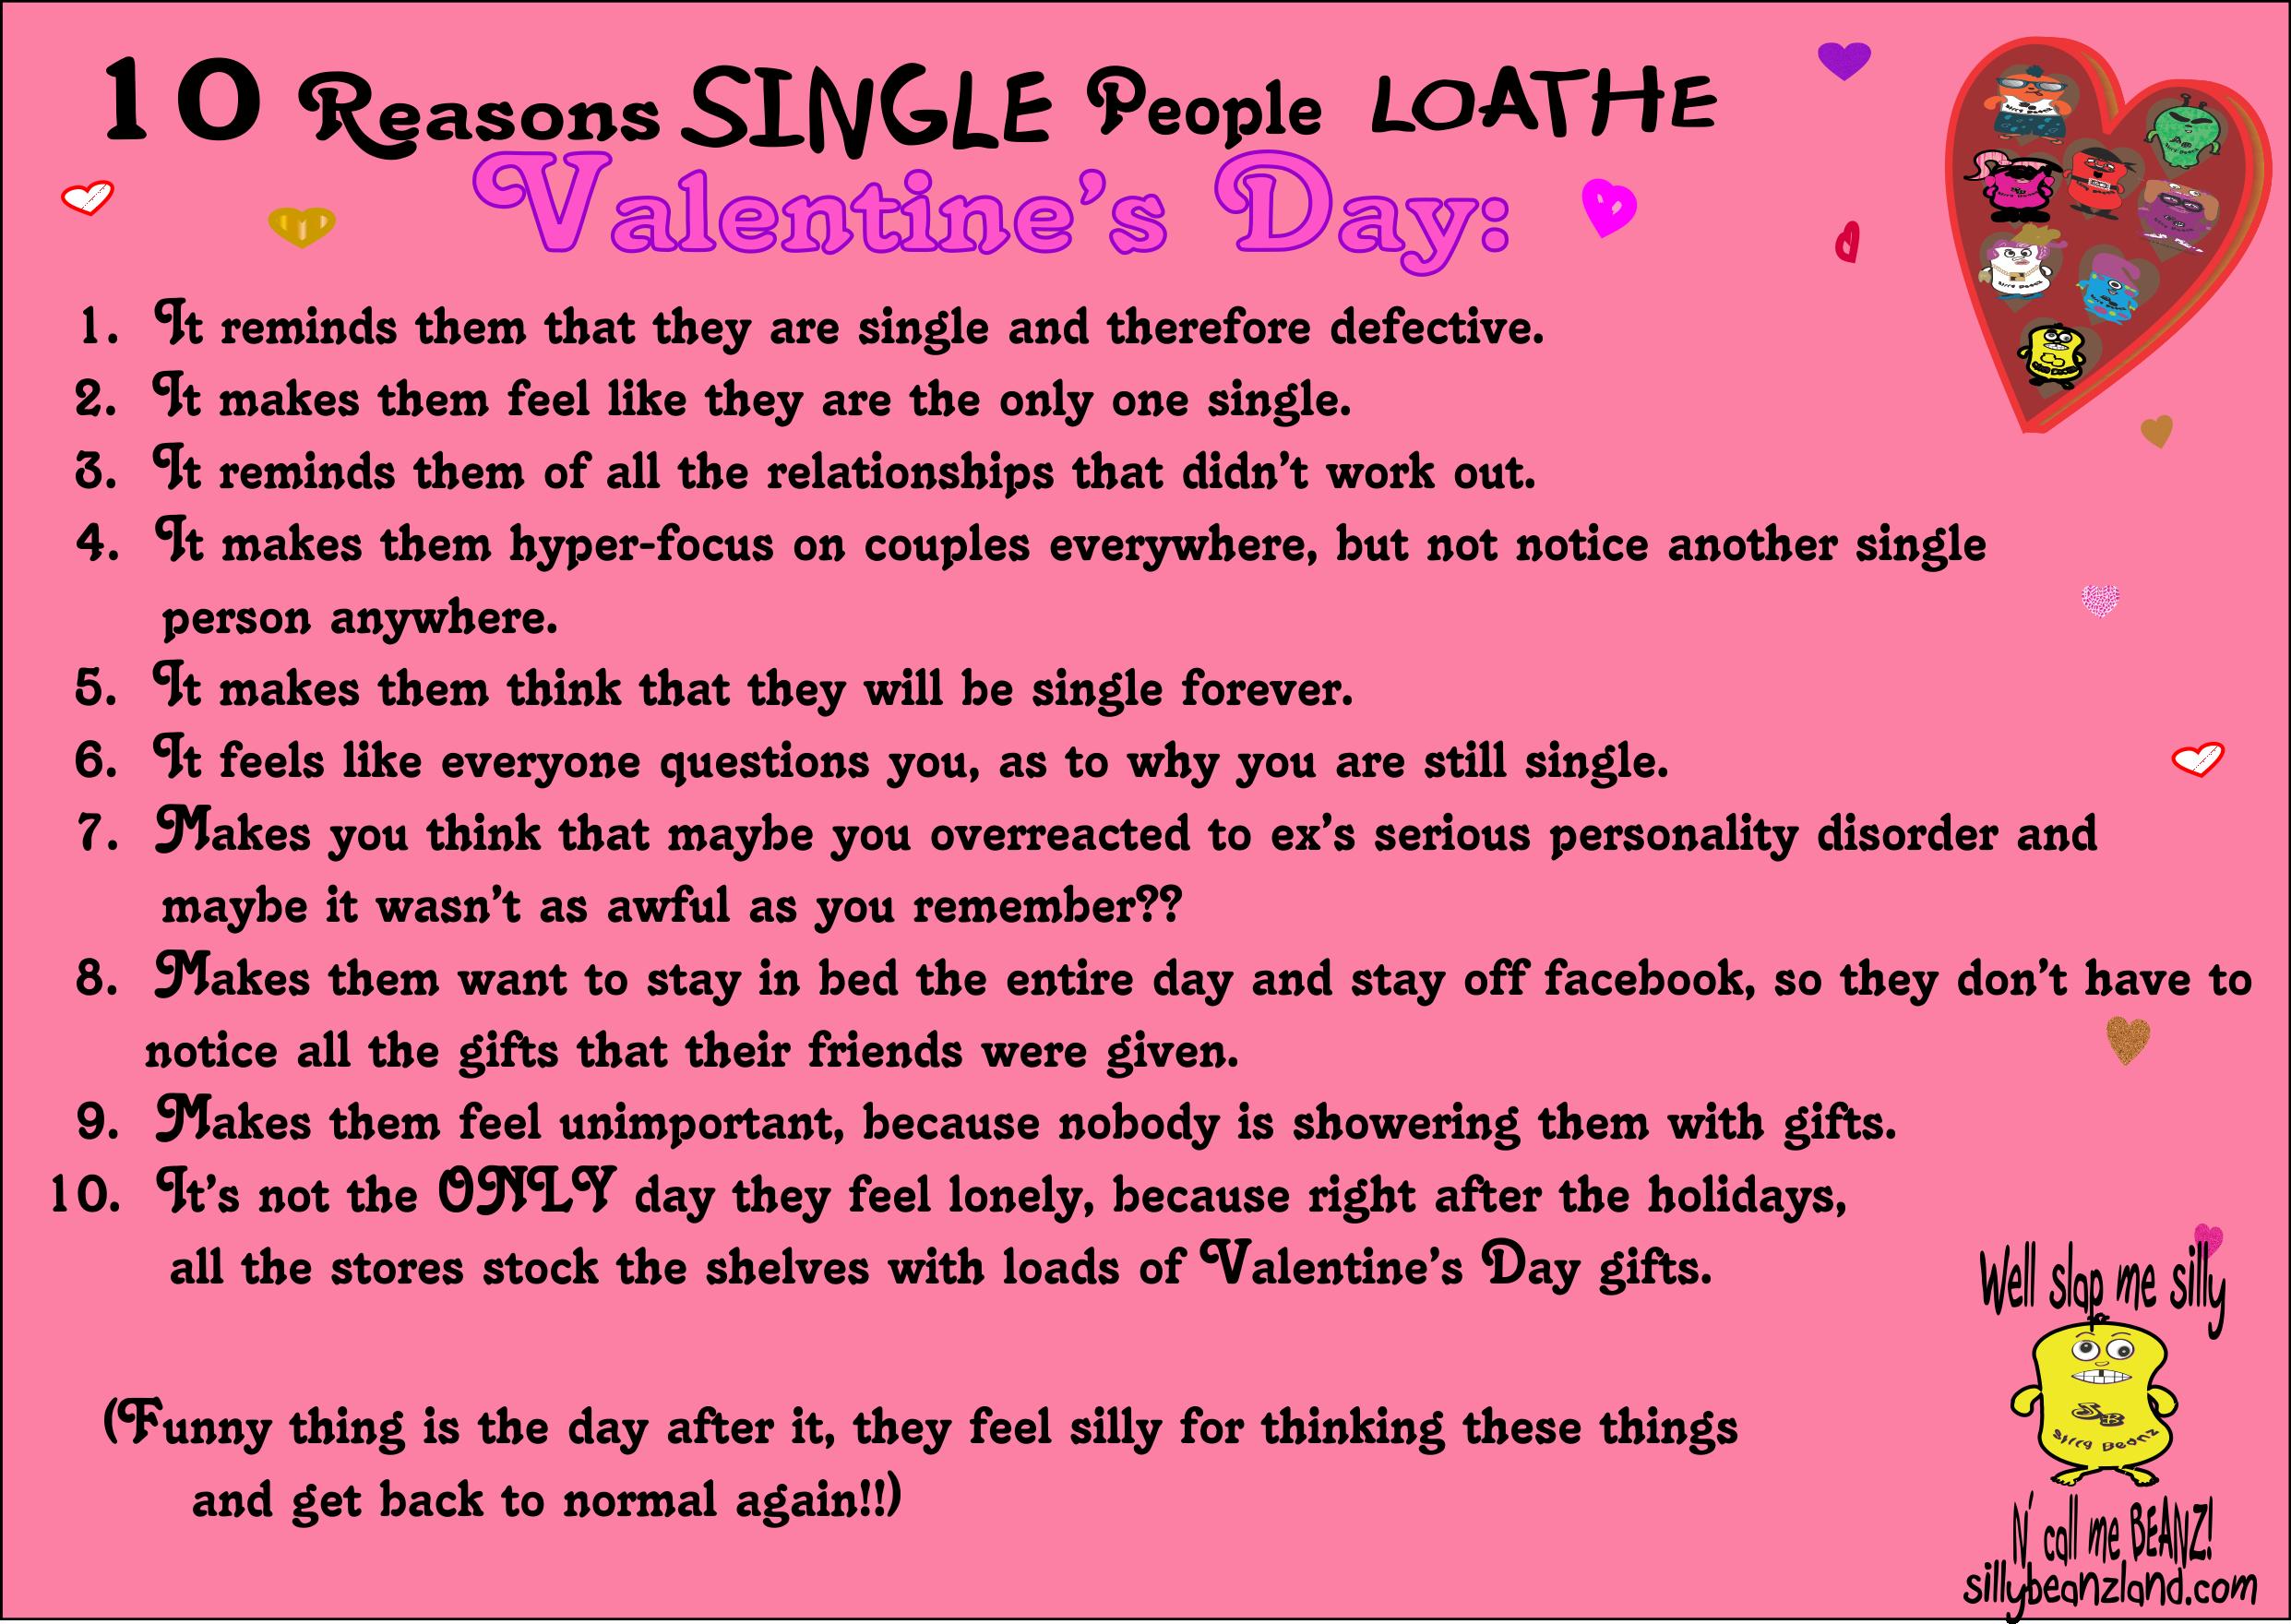 10 reasonsloathevday